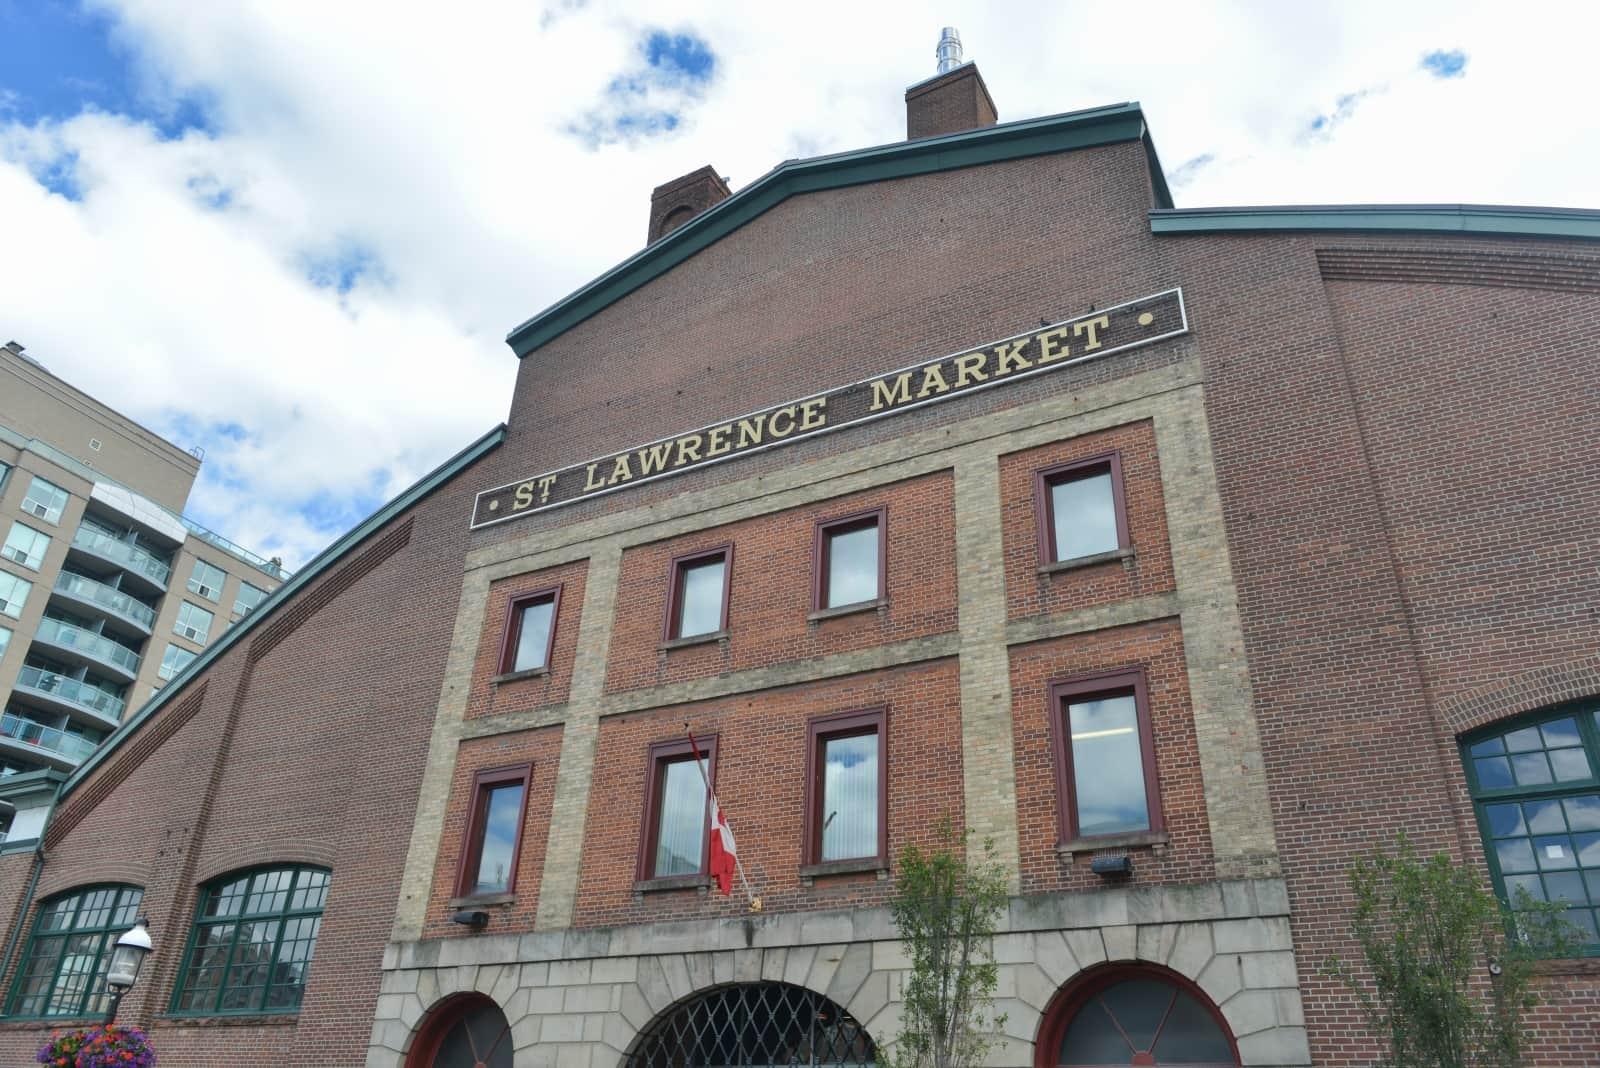 Neben dem Kensington Market der Hauptmarkt in Toronto, der St. Lawrence Market. Foto demerzel21